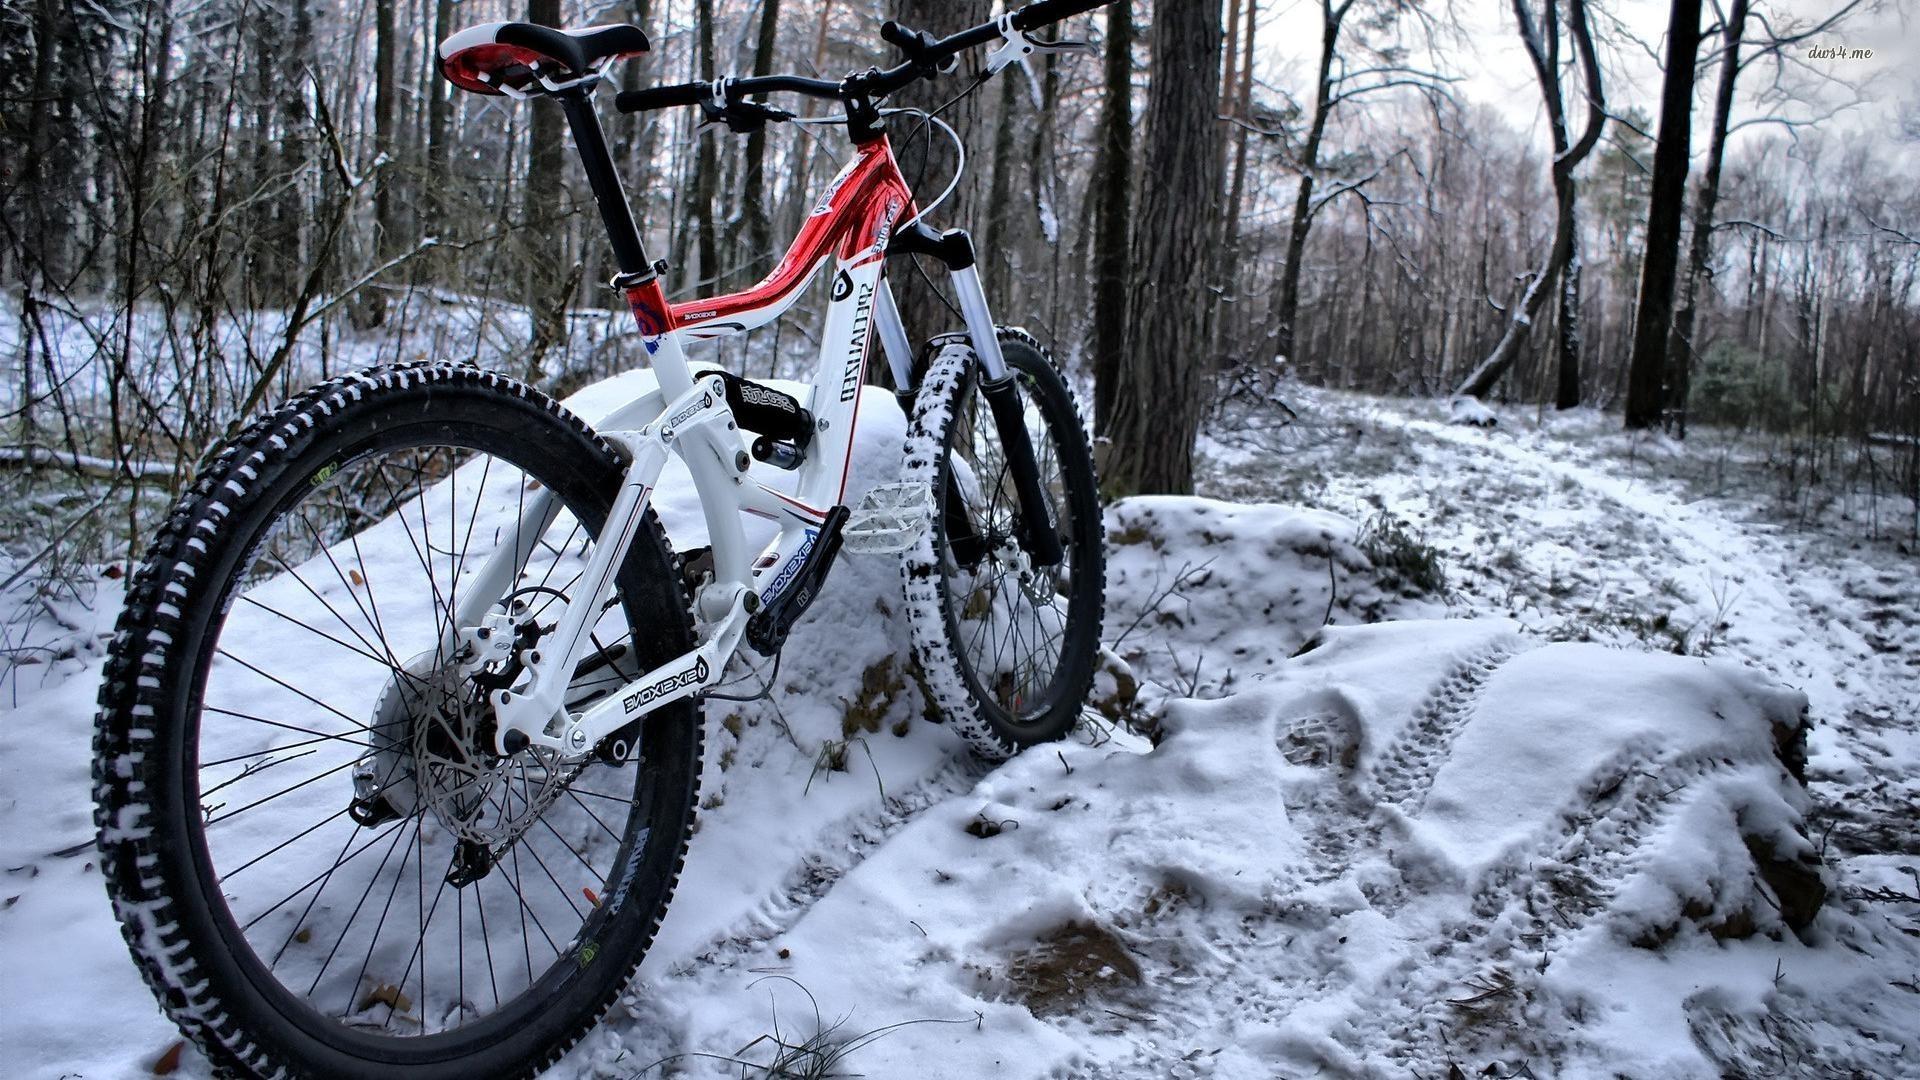 44 Mountain Bike Wallpapers High Resolution On